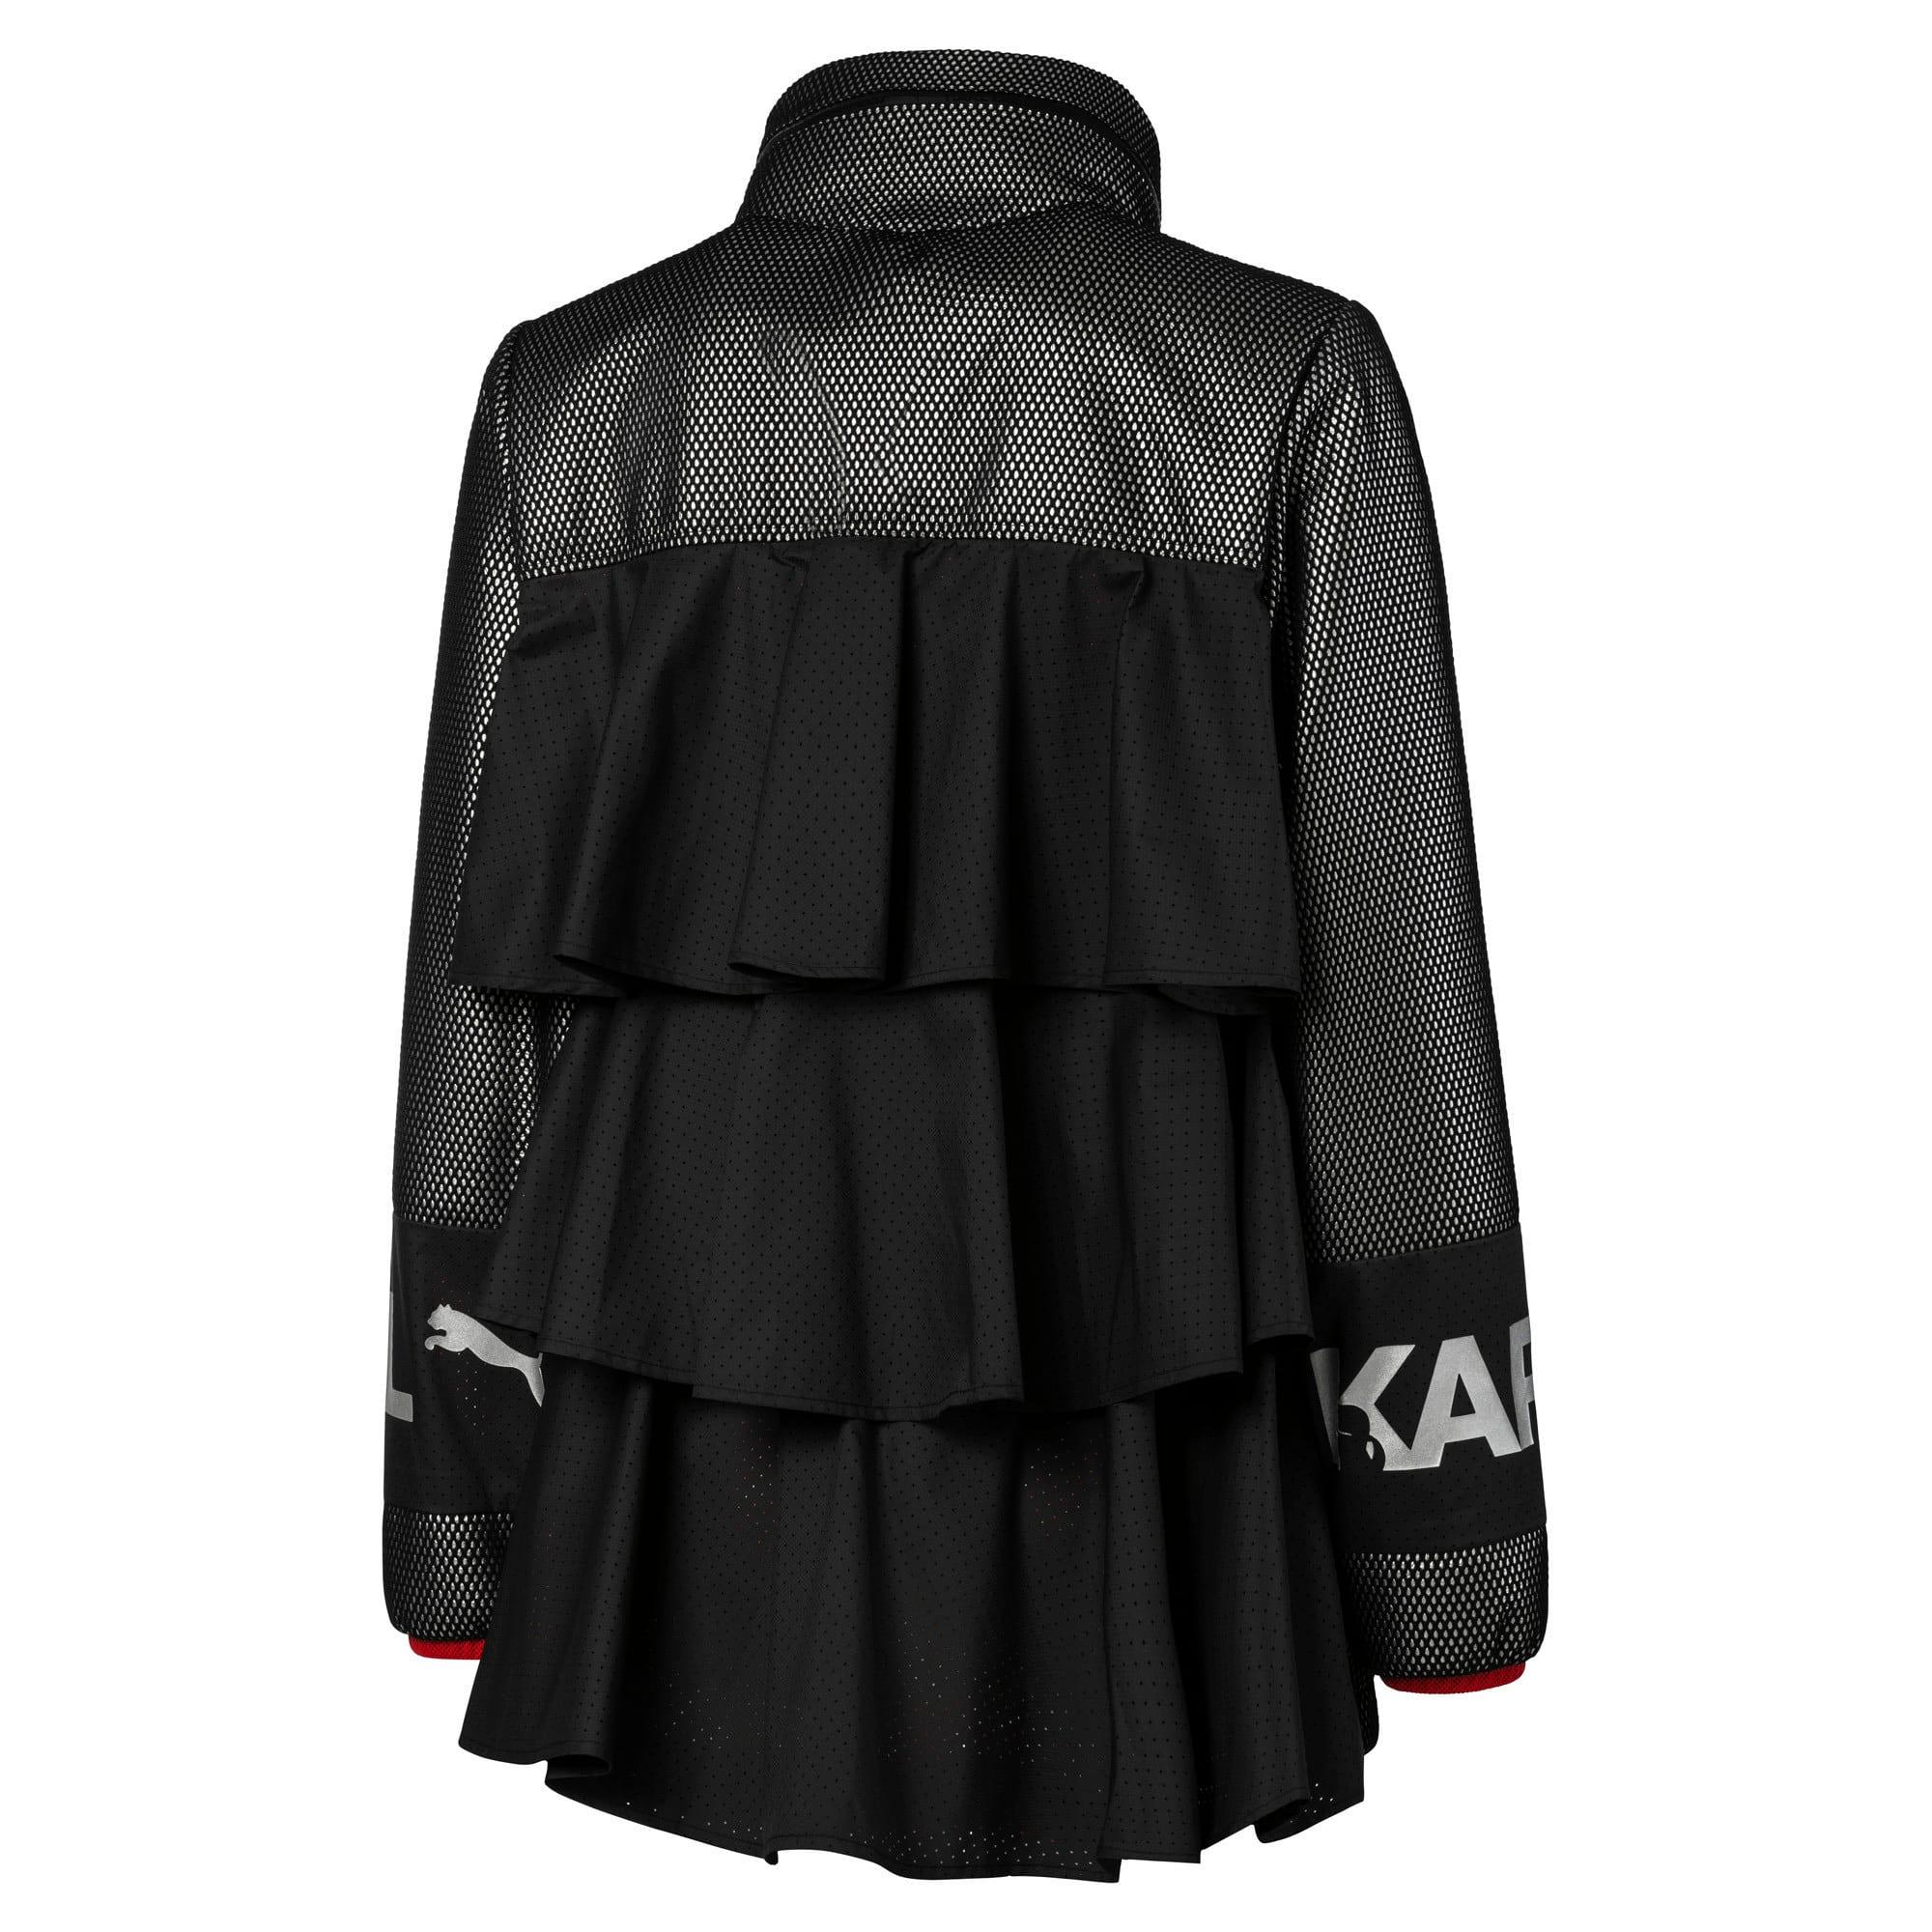 Thumbnail 4 of PUMA x KARL LAGERFELD Women's Outerwear Jacket, Puma Black, medium